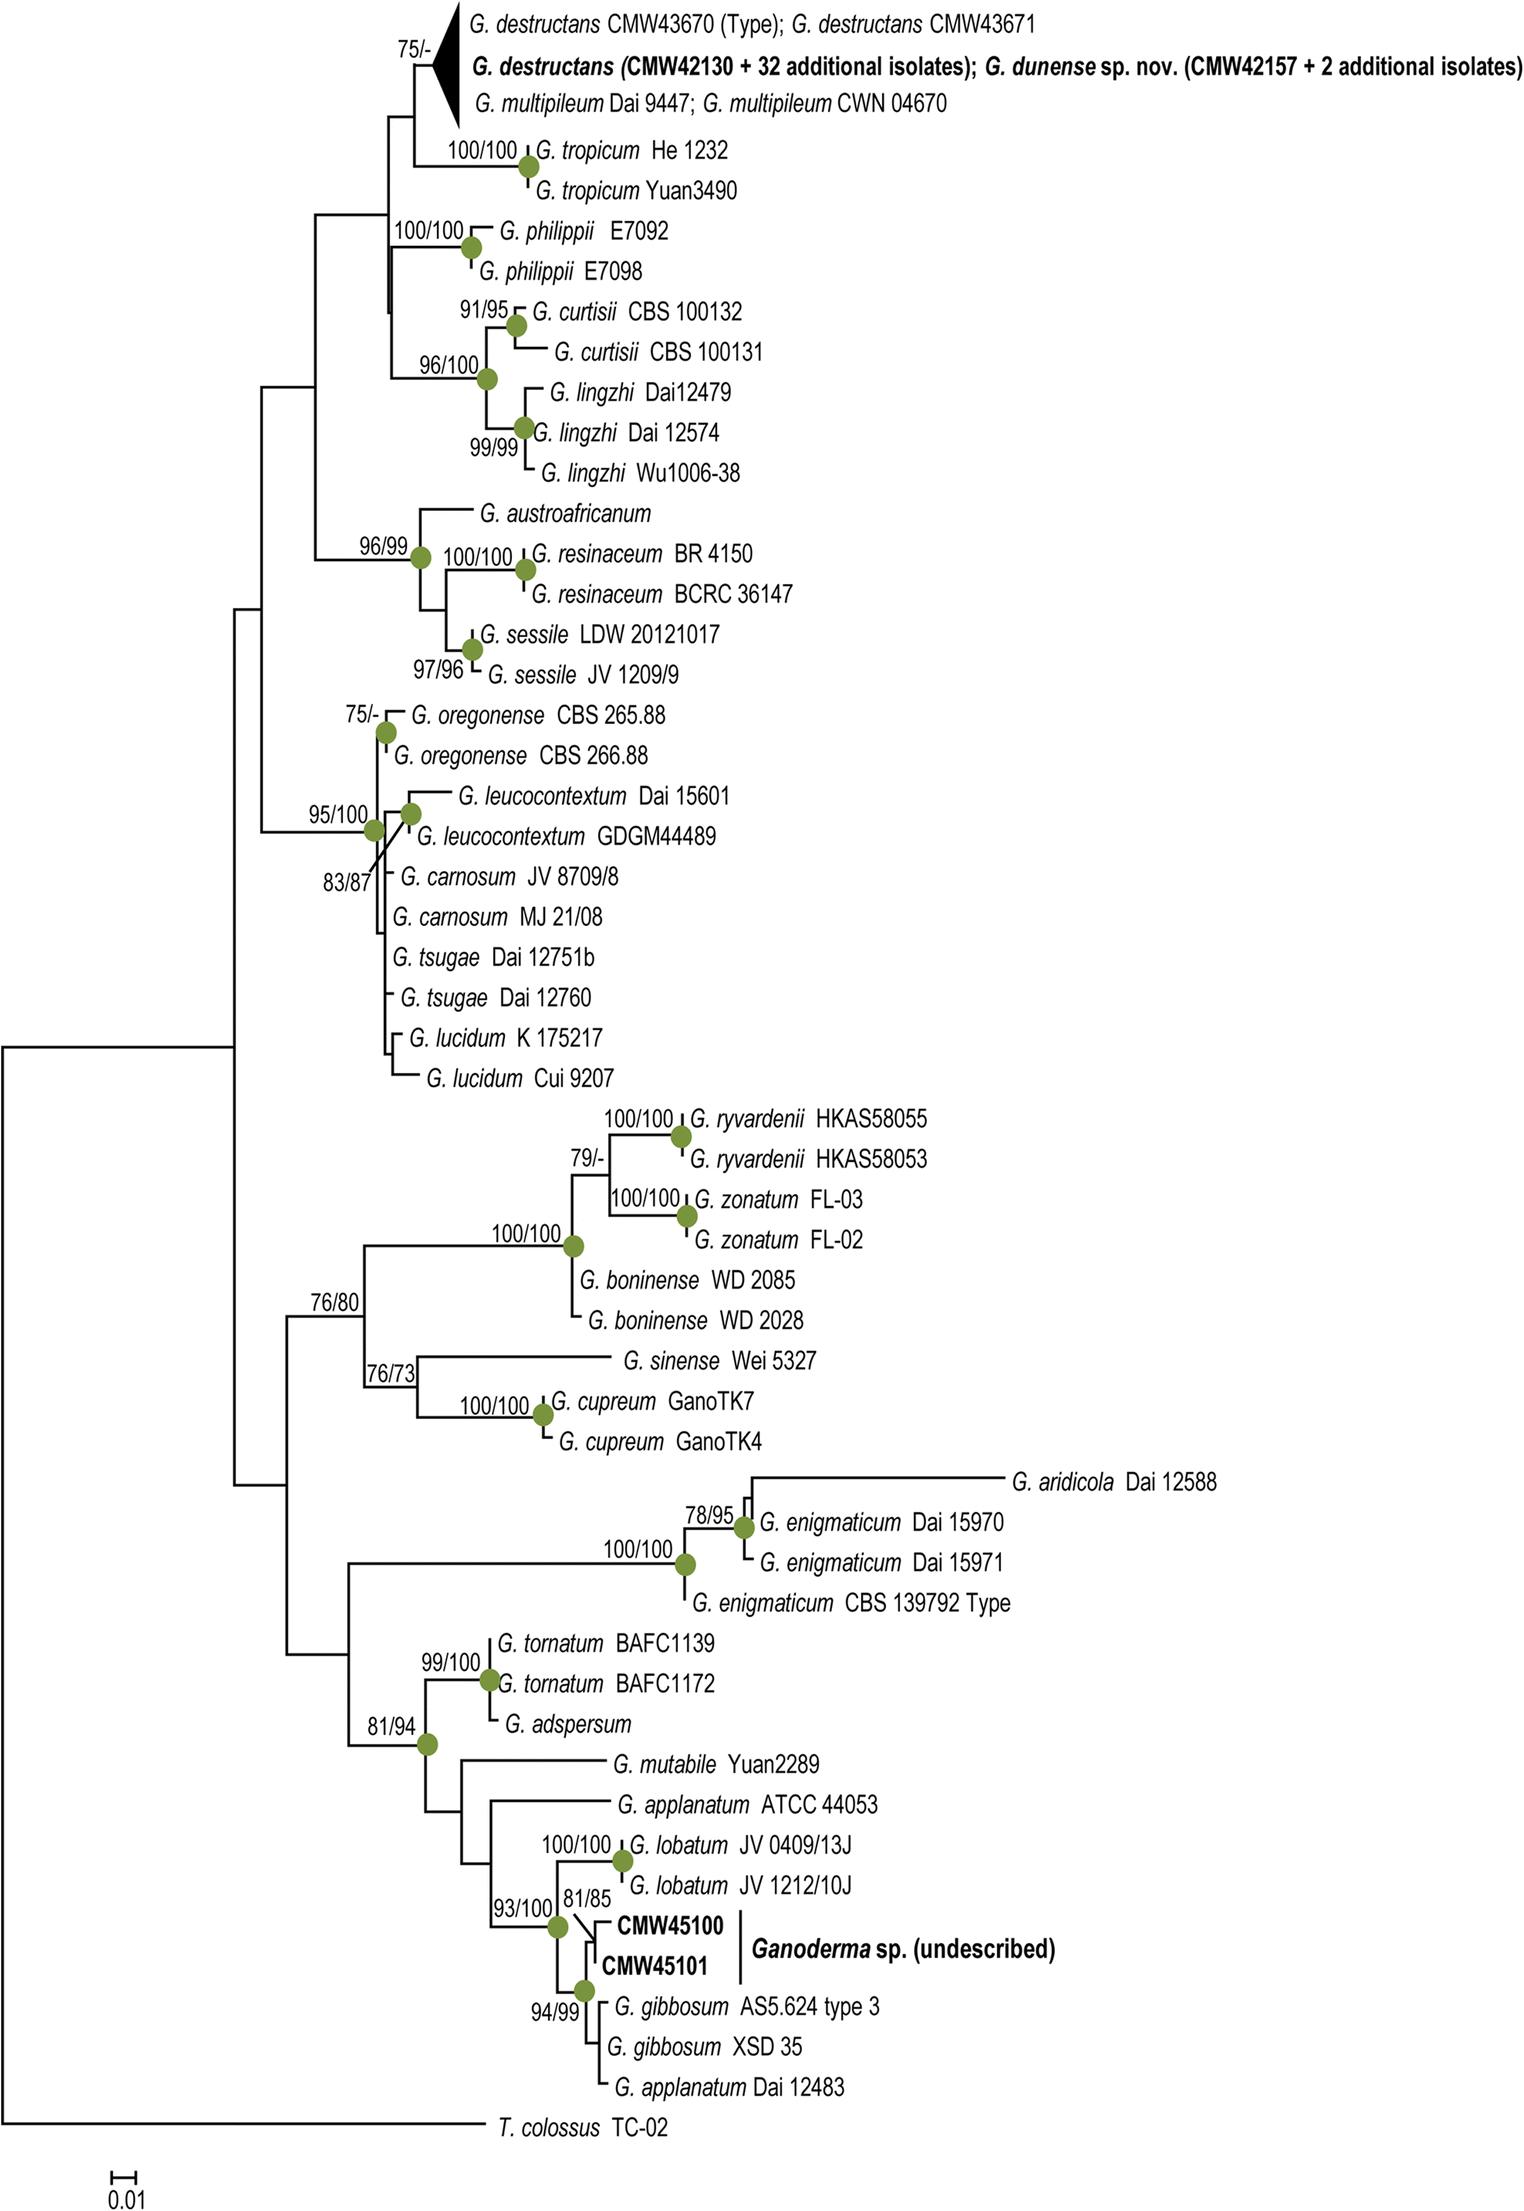 three ganoderma species including ganoderma dunense sp nov 72 Donk On 28 open image in new window